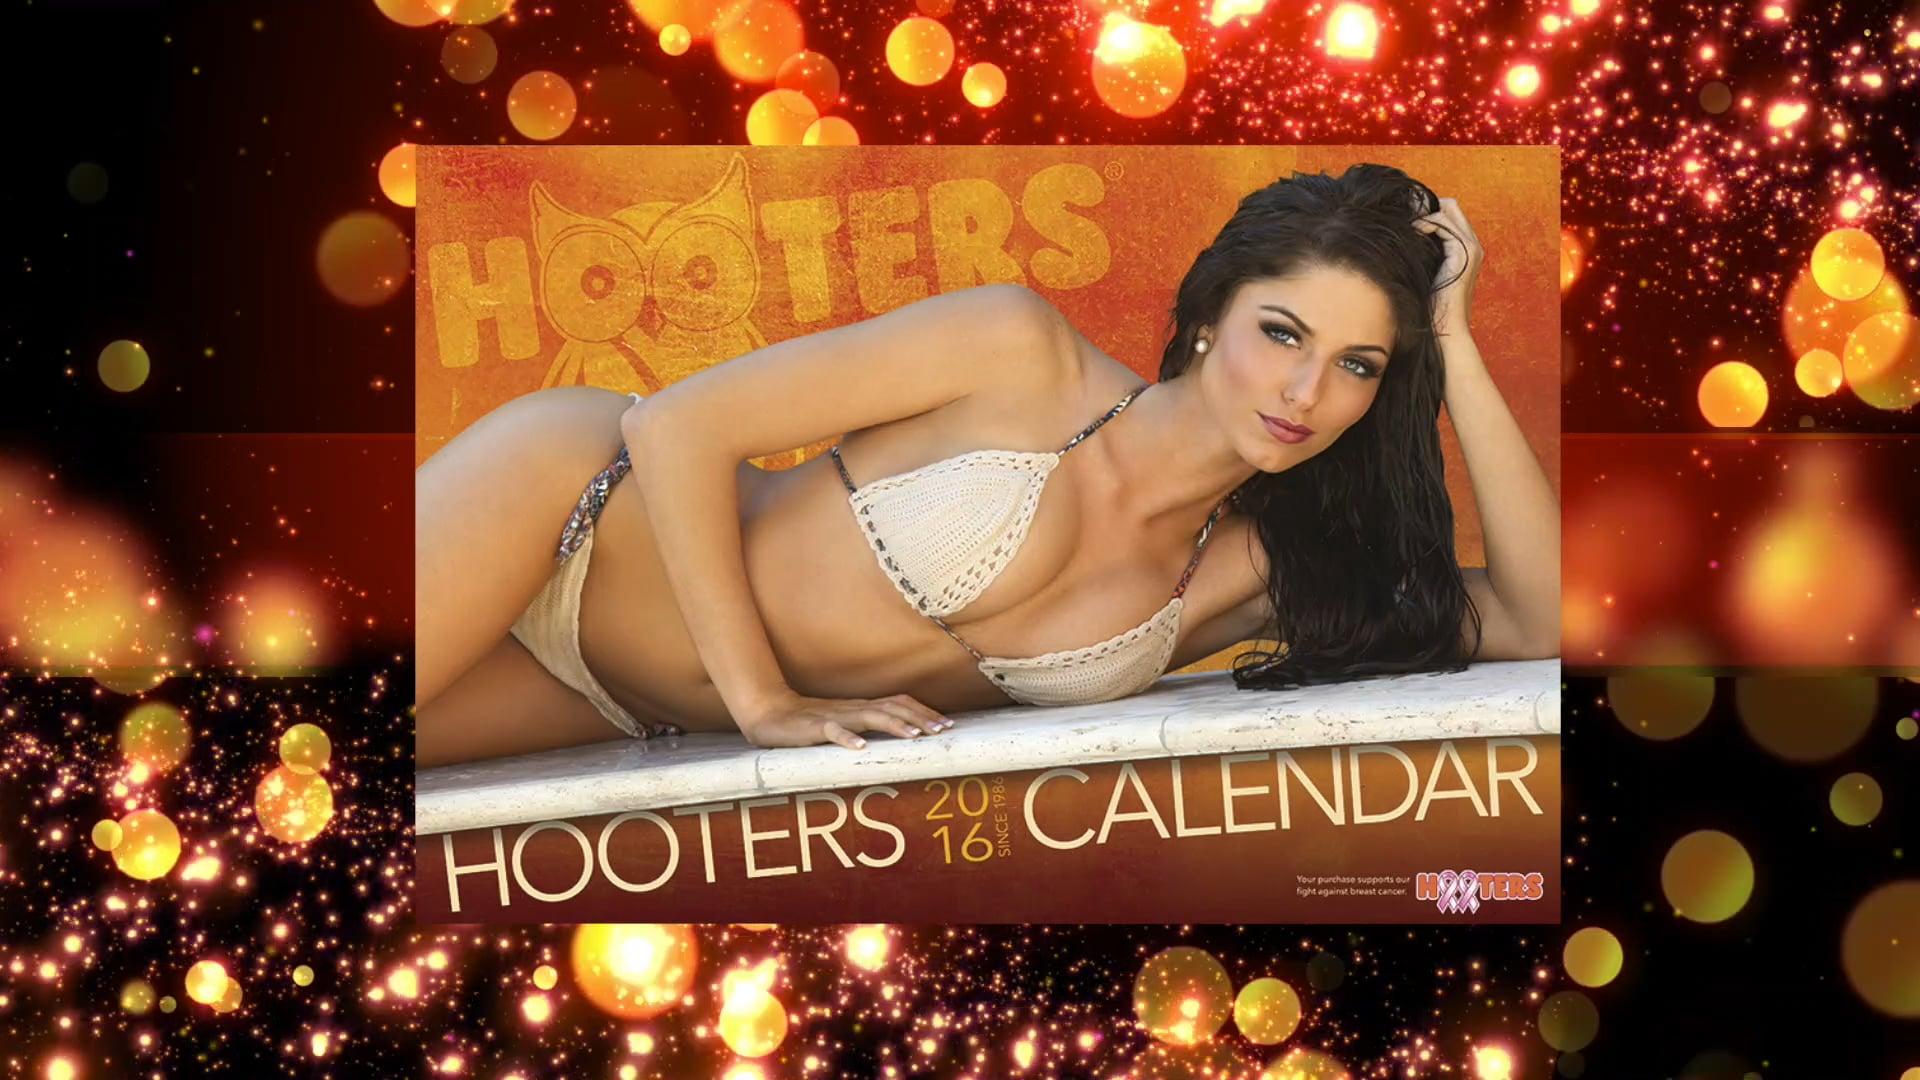 Hooters Calendar Promo 2016